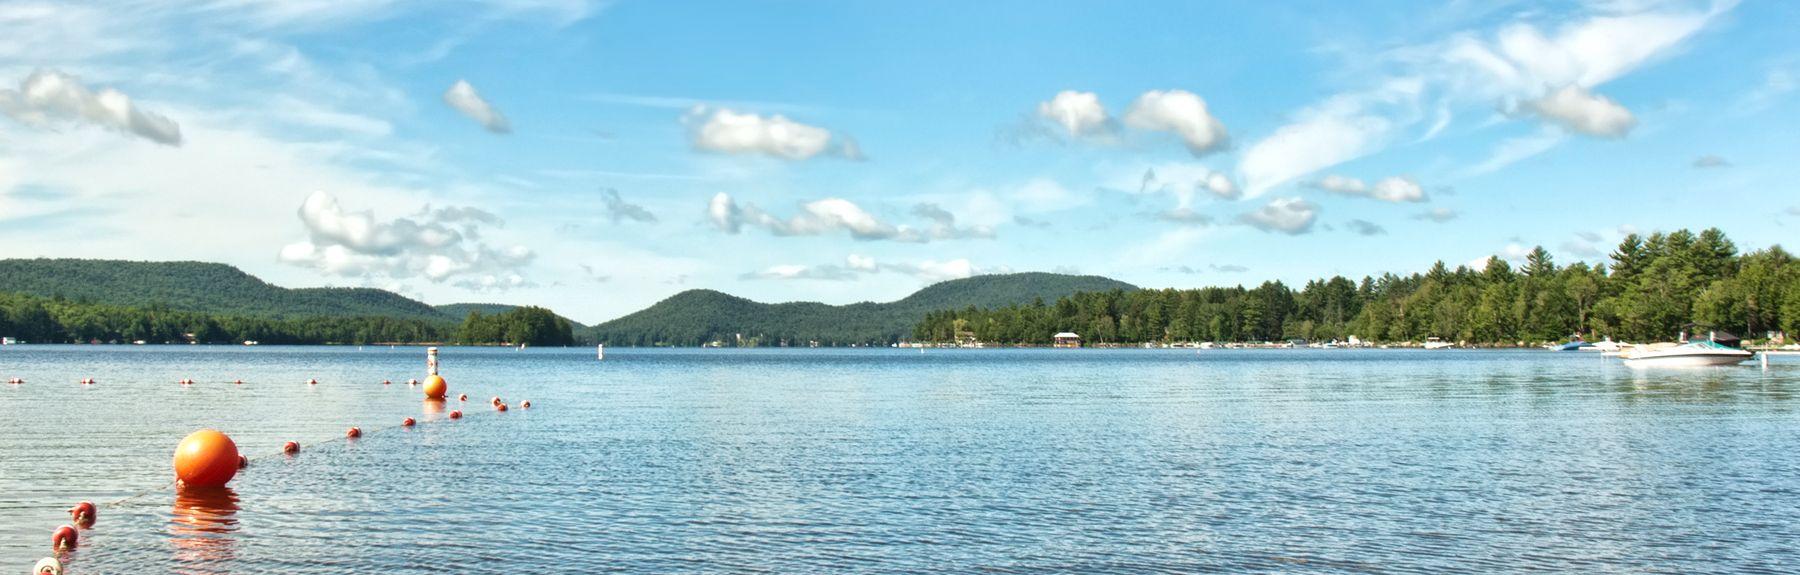 Lake Pleasant, New York, United States of America